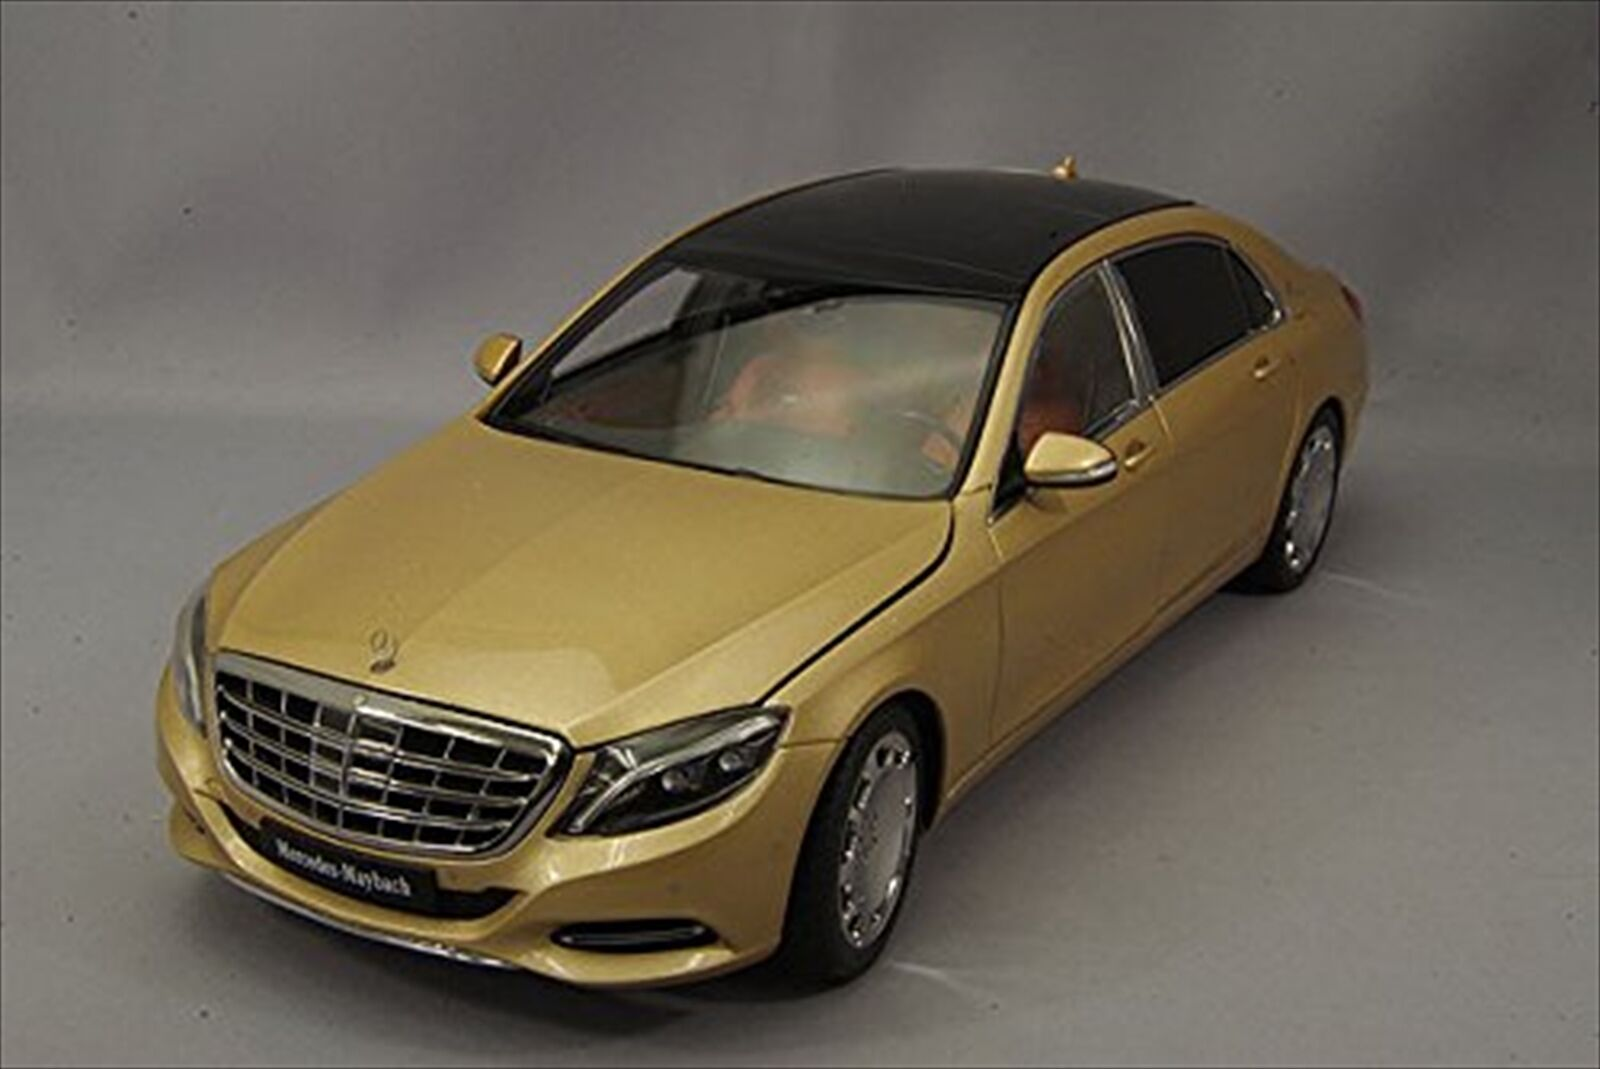 AUTOart 1 18 Mercedes  Maybach S 600 Champagne or Composite Model 76294  magasin en ligne